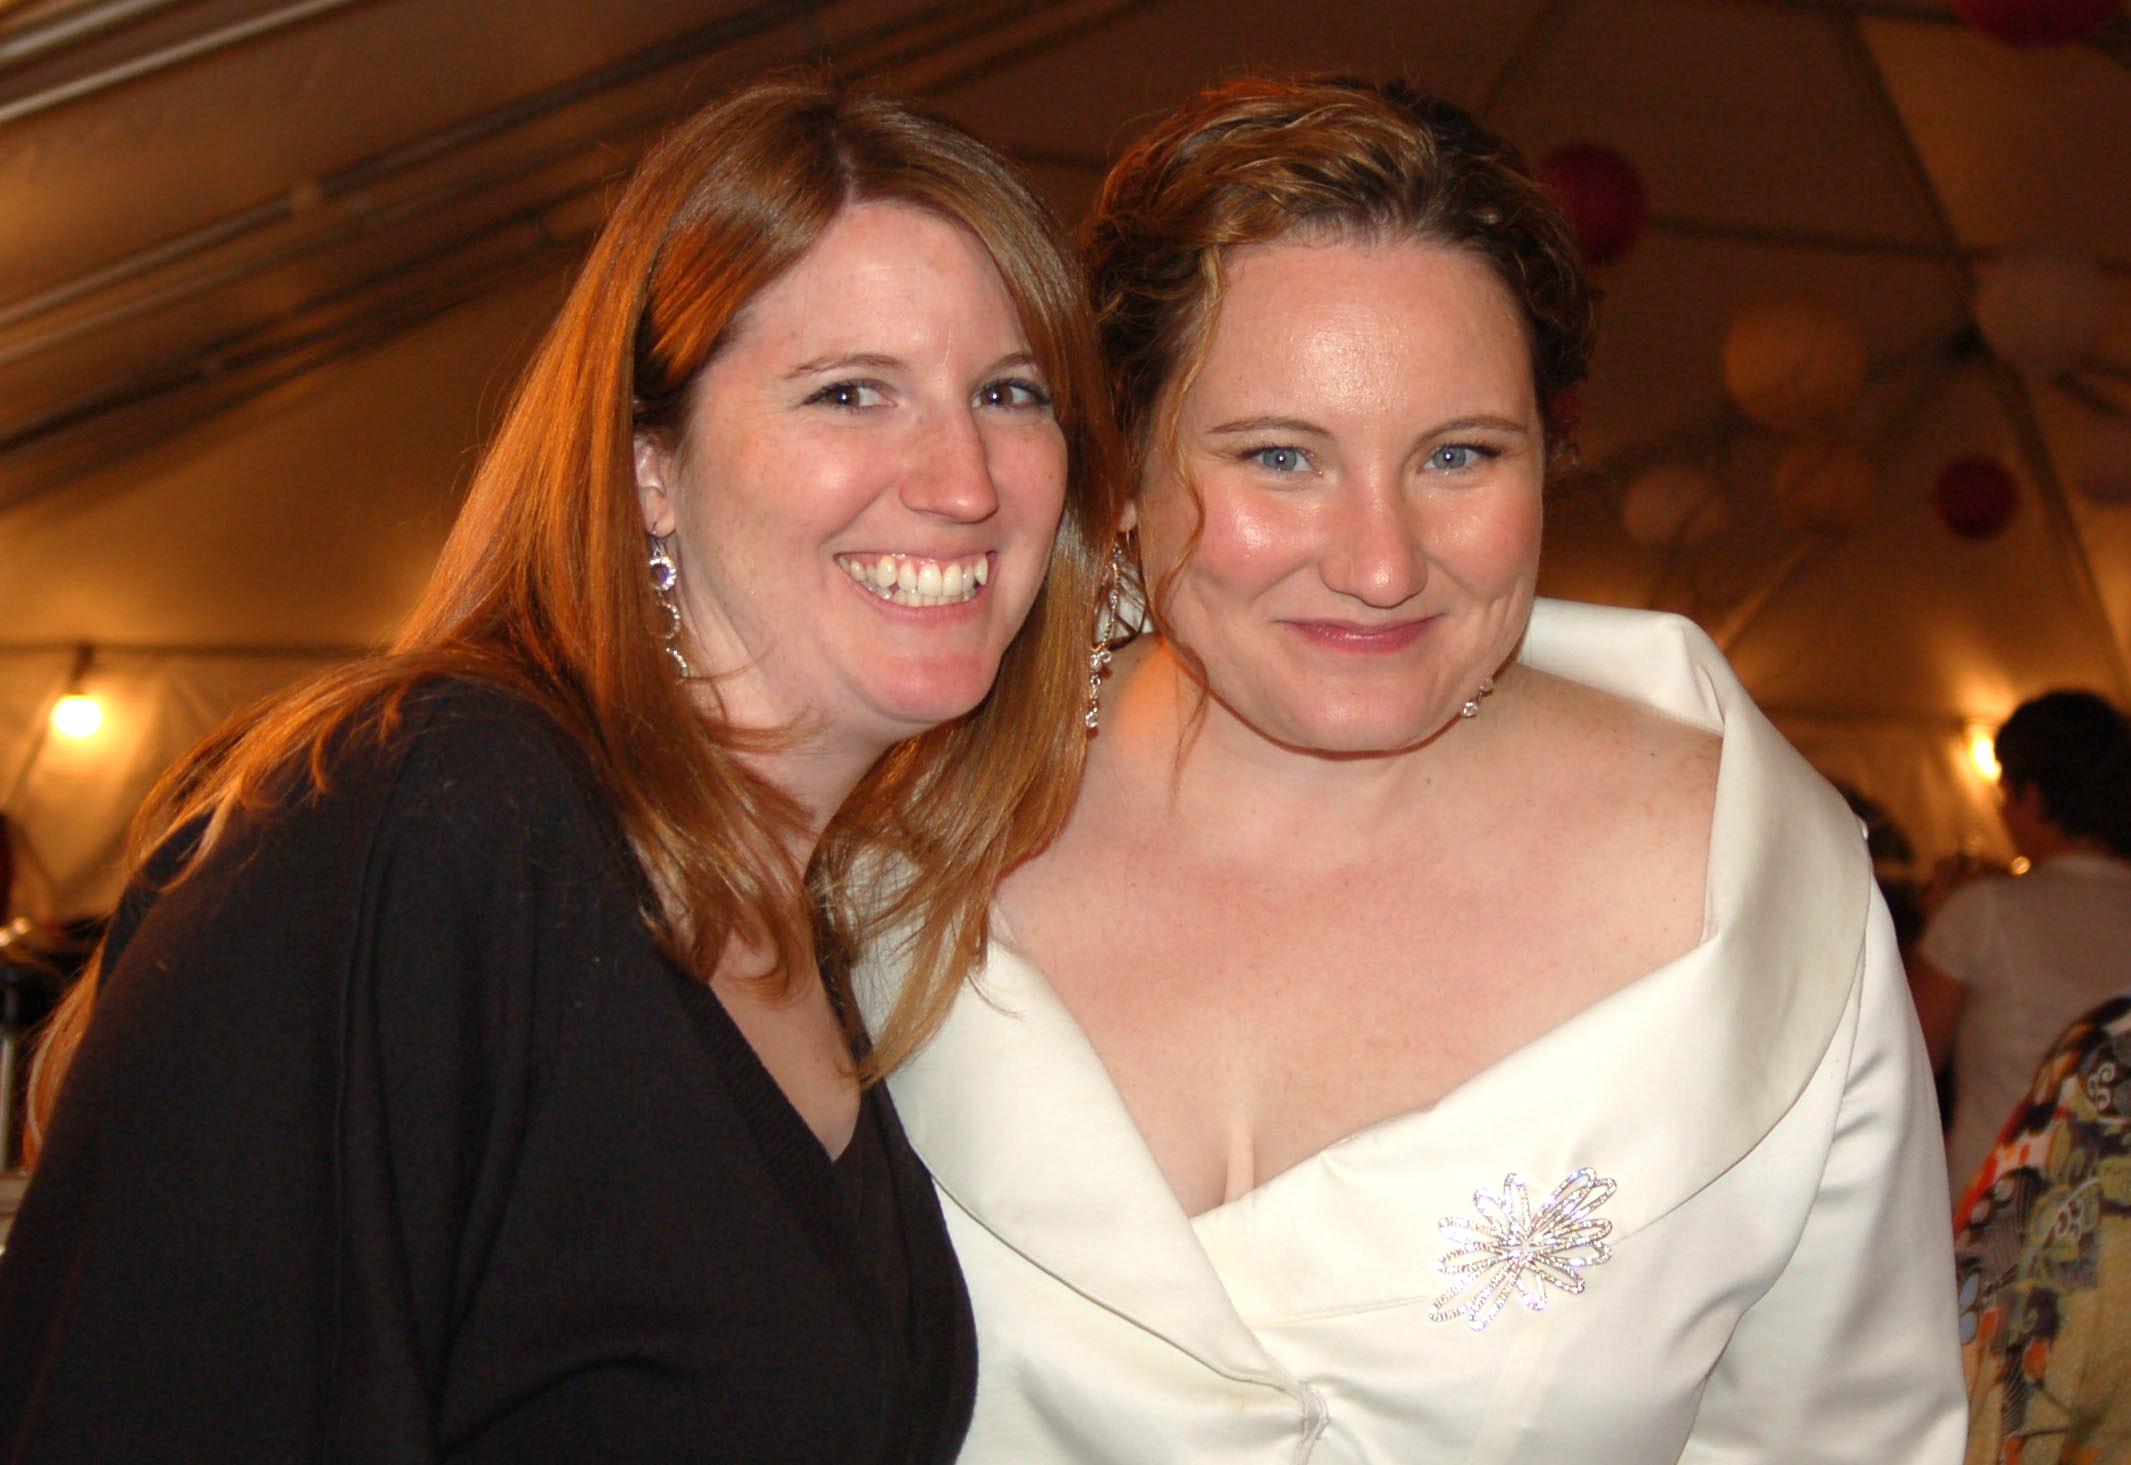 Mo's wedding day! 2008